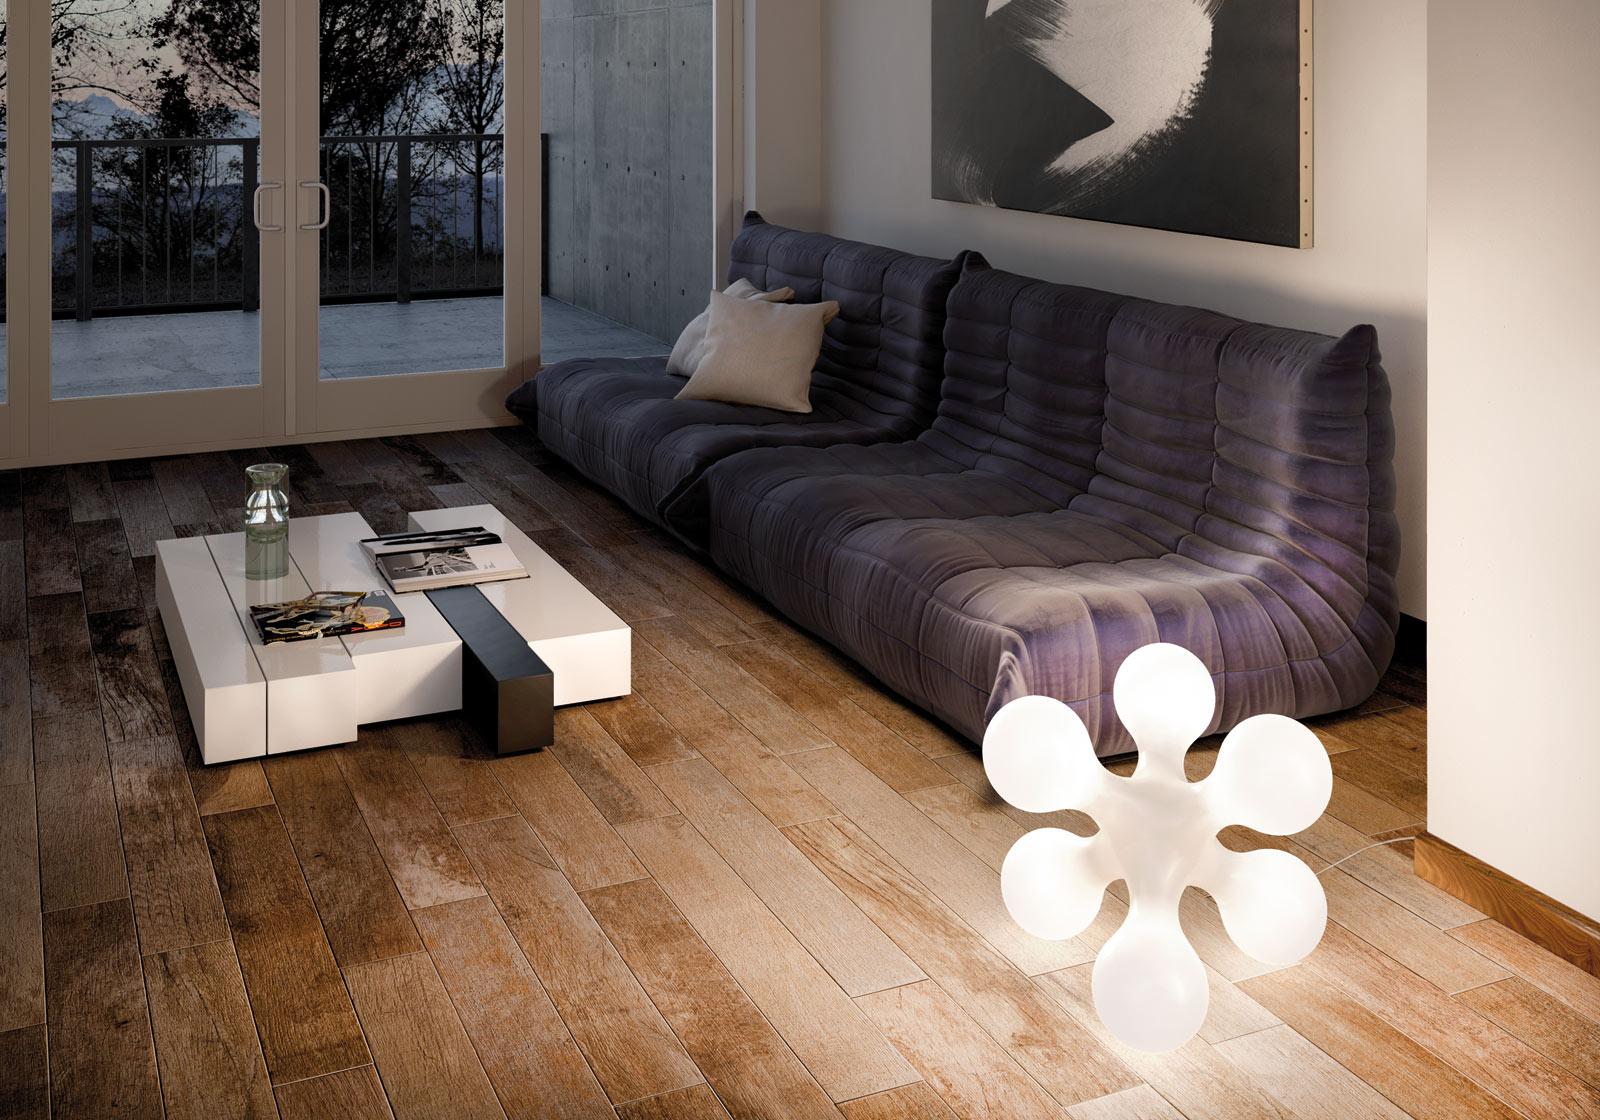 ATOMIUM-lampada-Kundalini-Casa-a-misura-di-bimbo-Addessi-Design